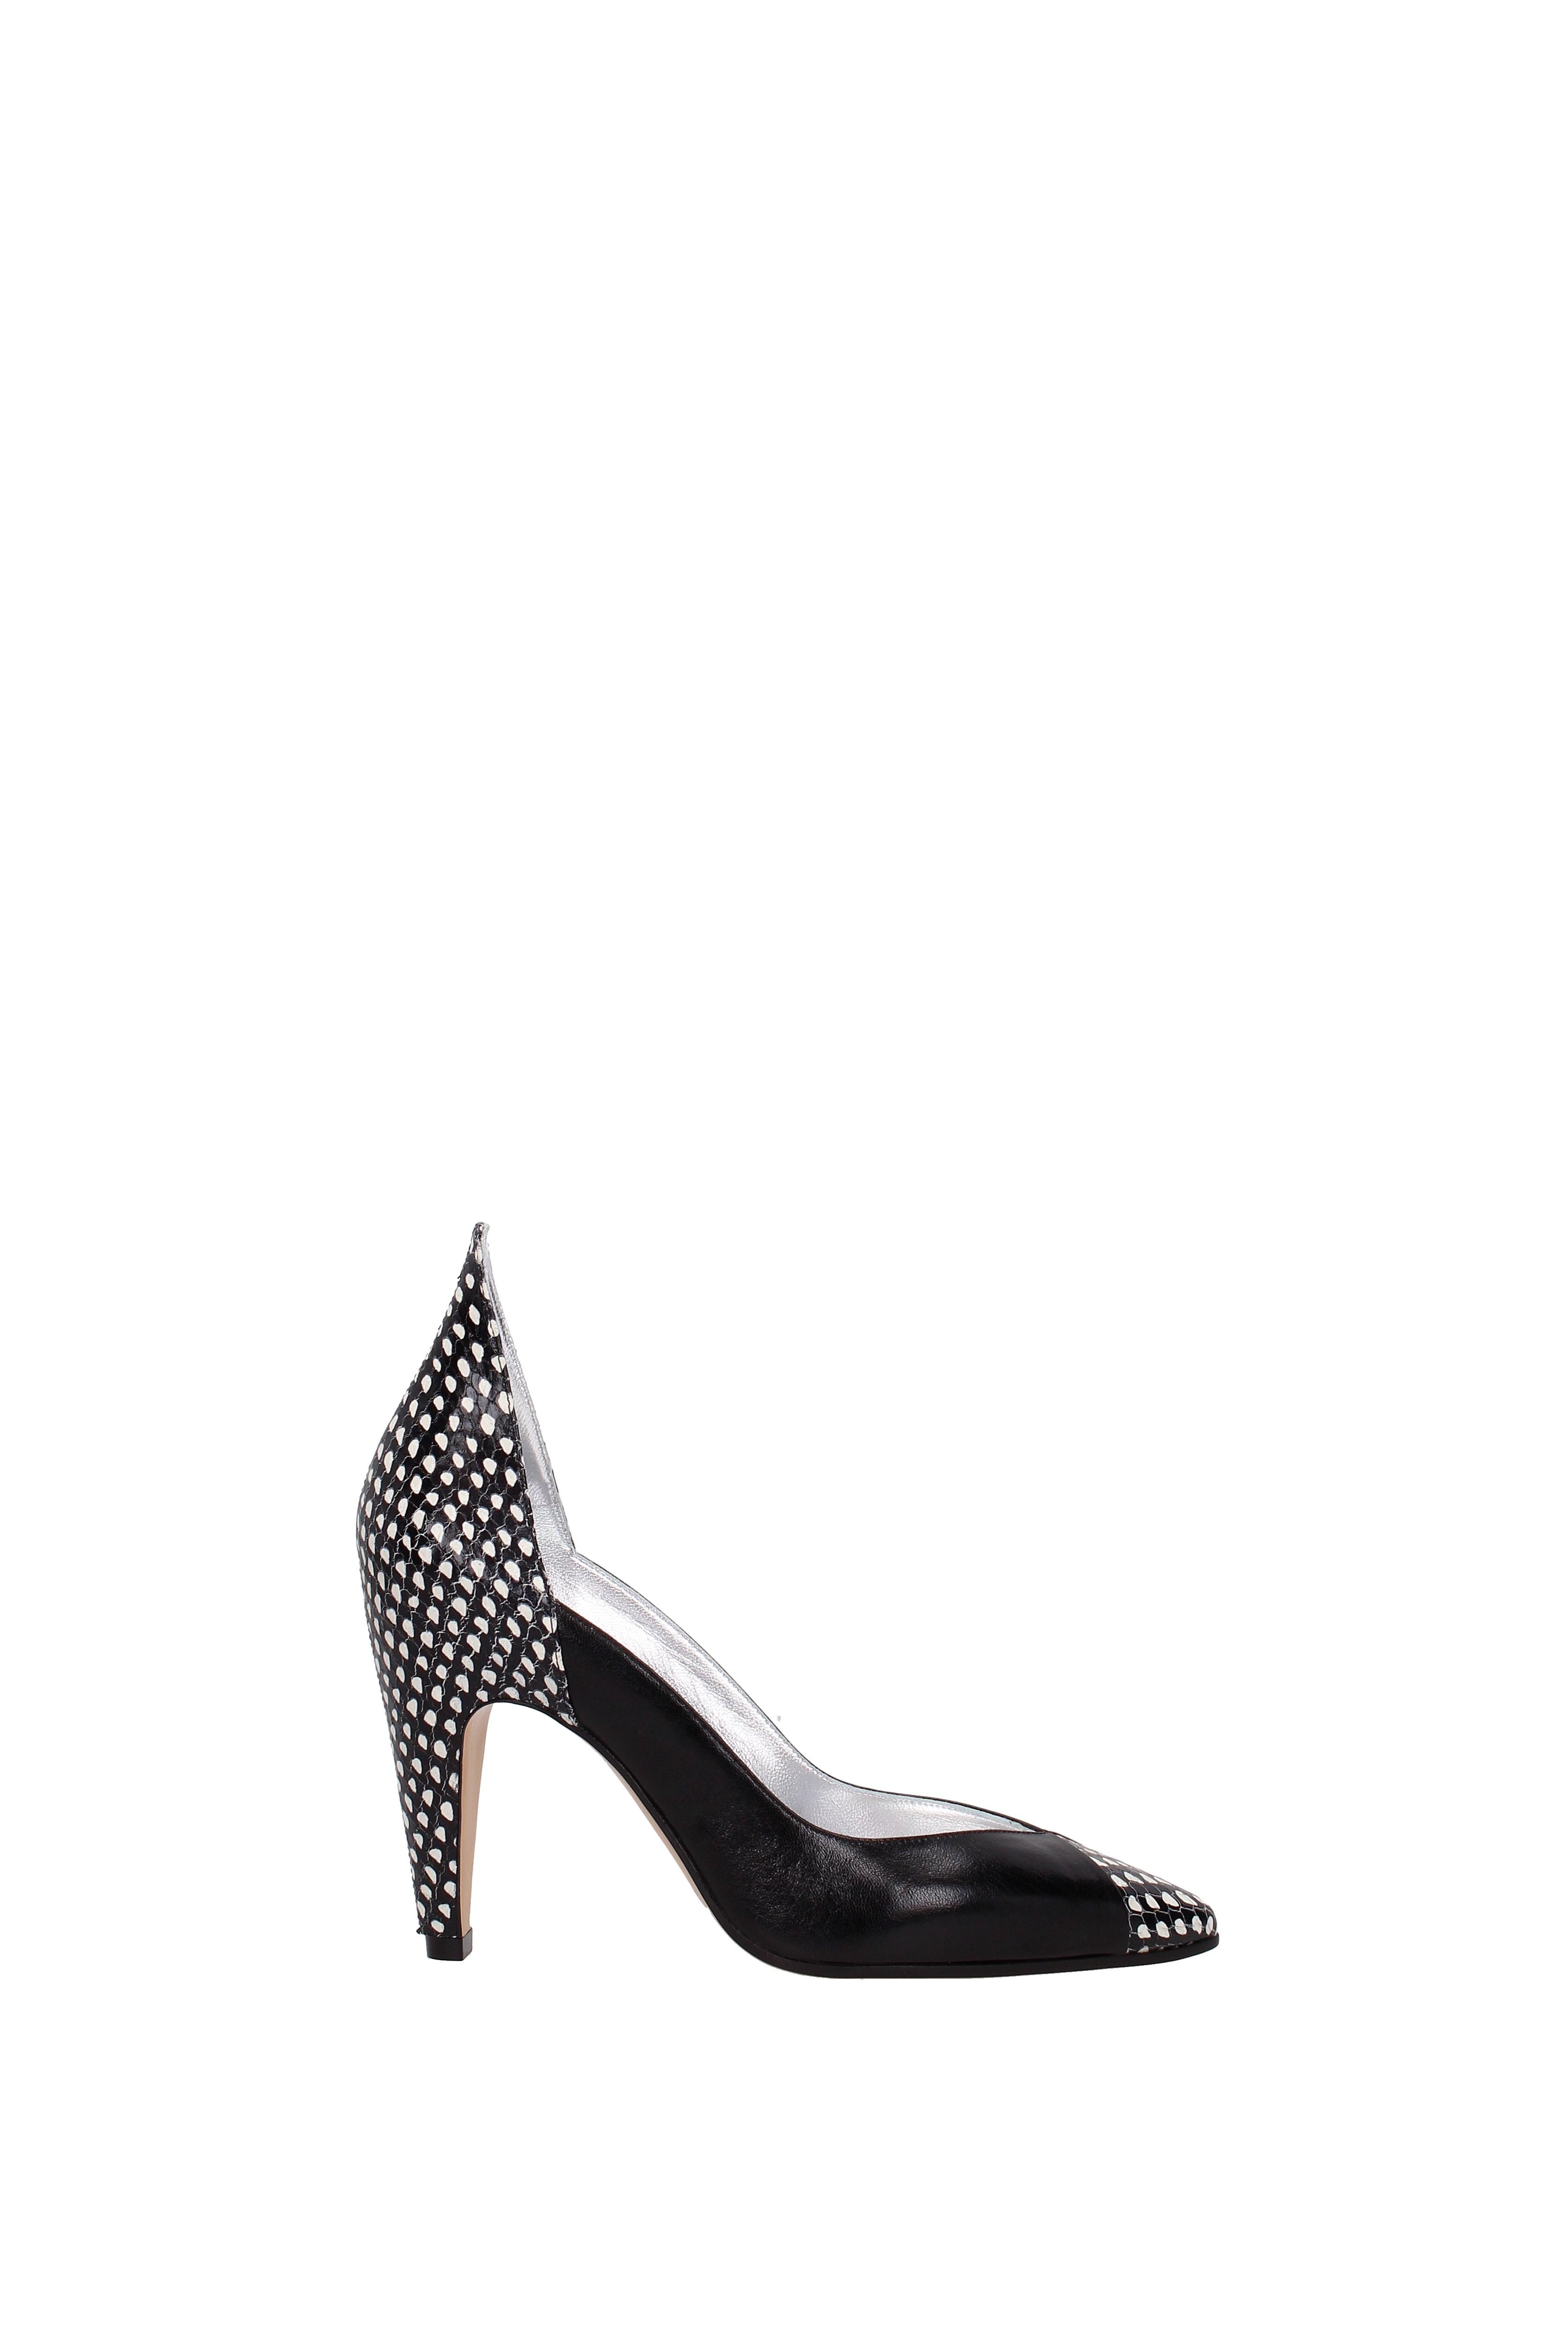 Pumps Givenchy Damen Damen Damen - Leder (BE400AE03S) f4969f